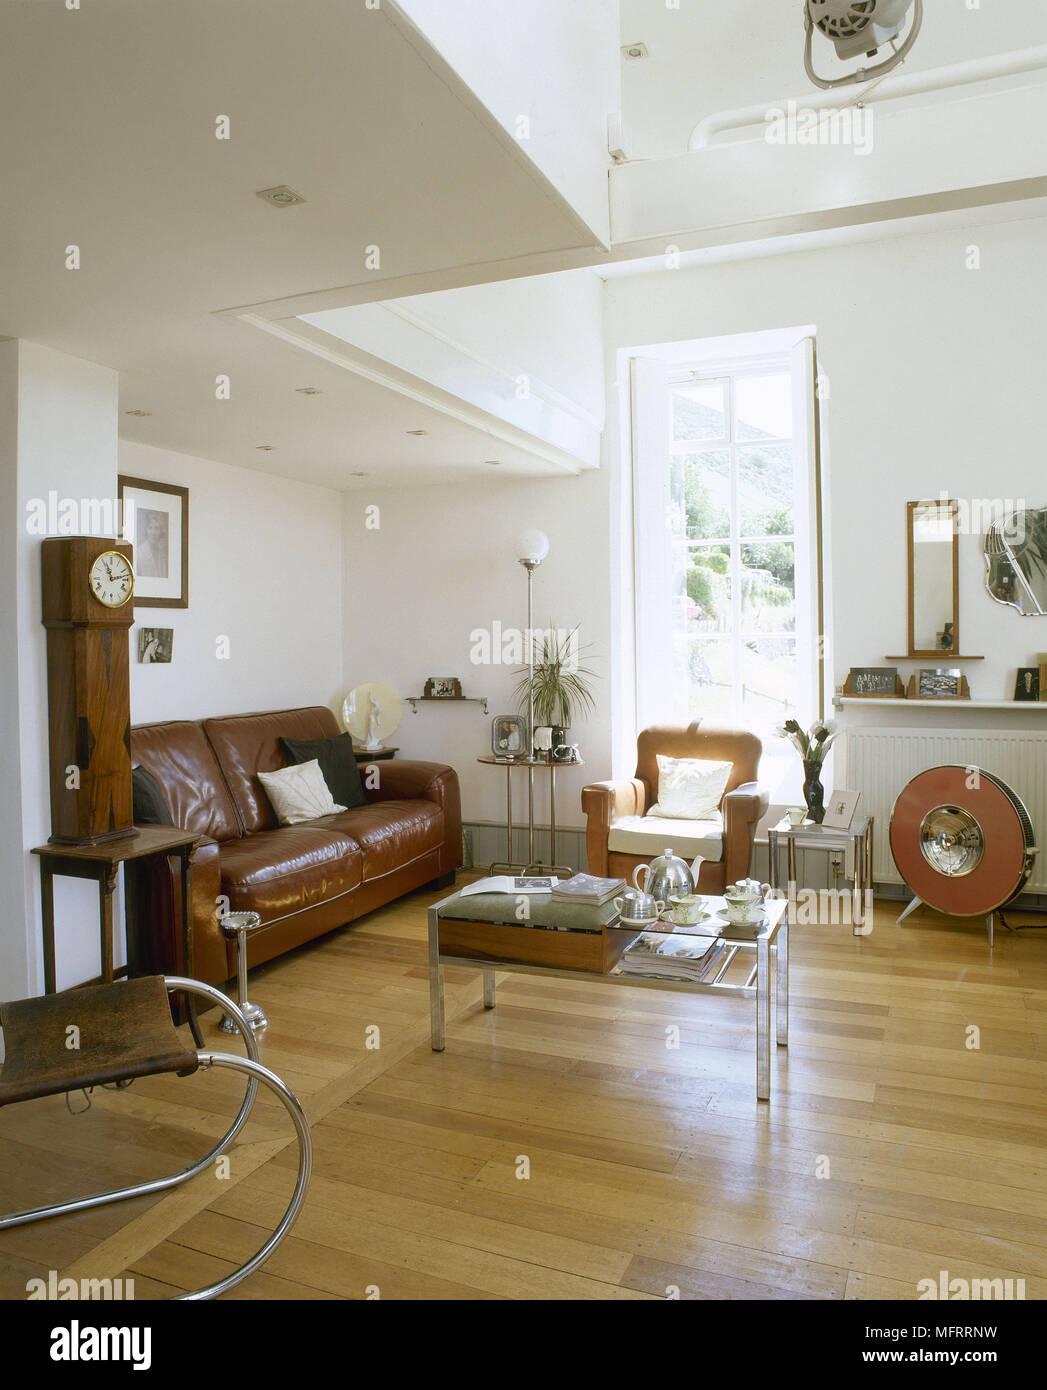 Ein Modernes Wohnzimmer Mit Retro Styling Holz Leder Sofa Chrom